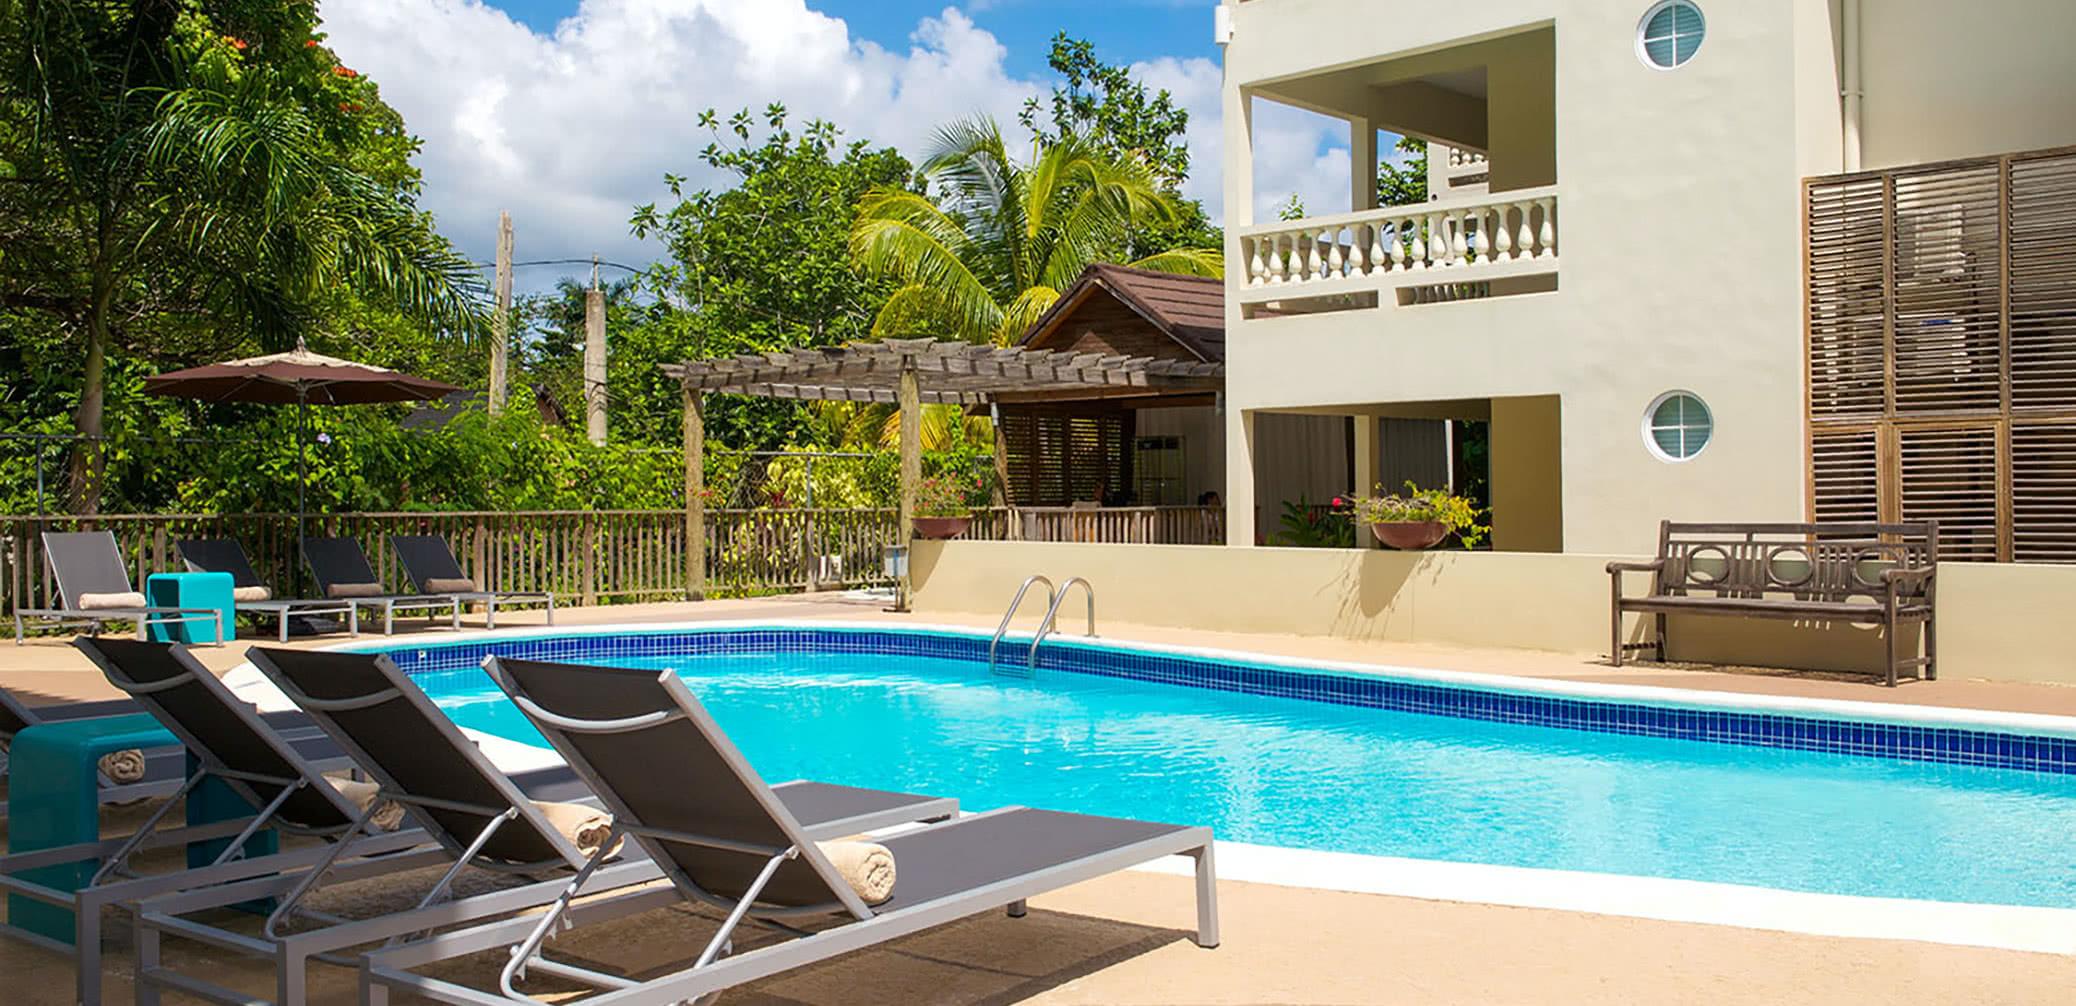 Tripadvisor's Best Hotels In Jamaica